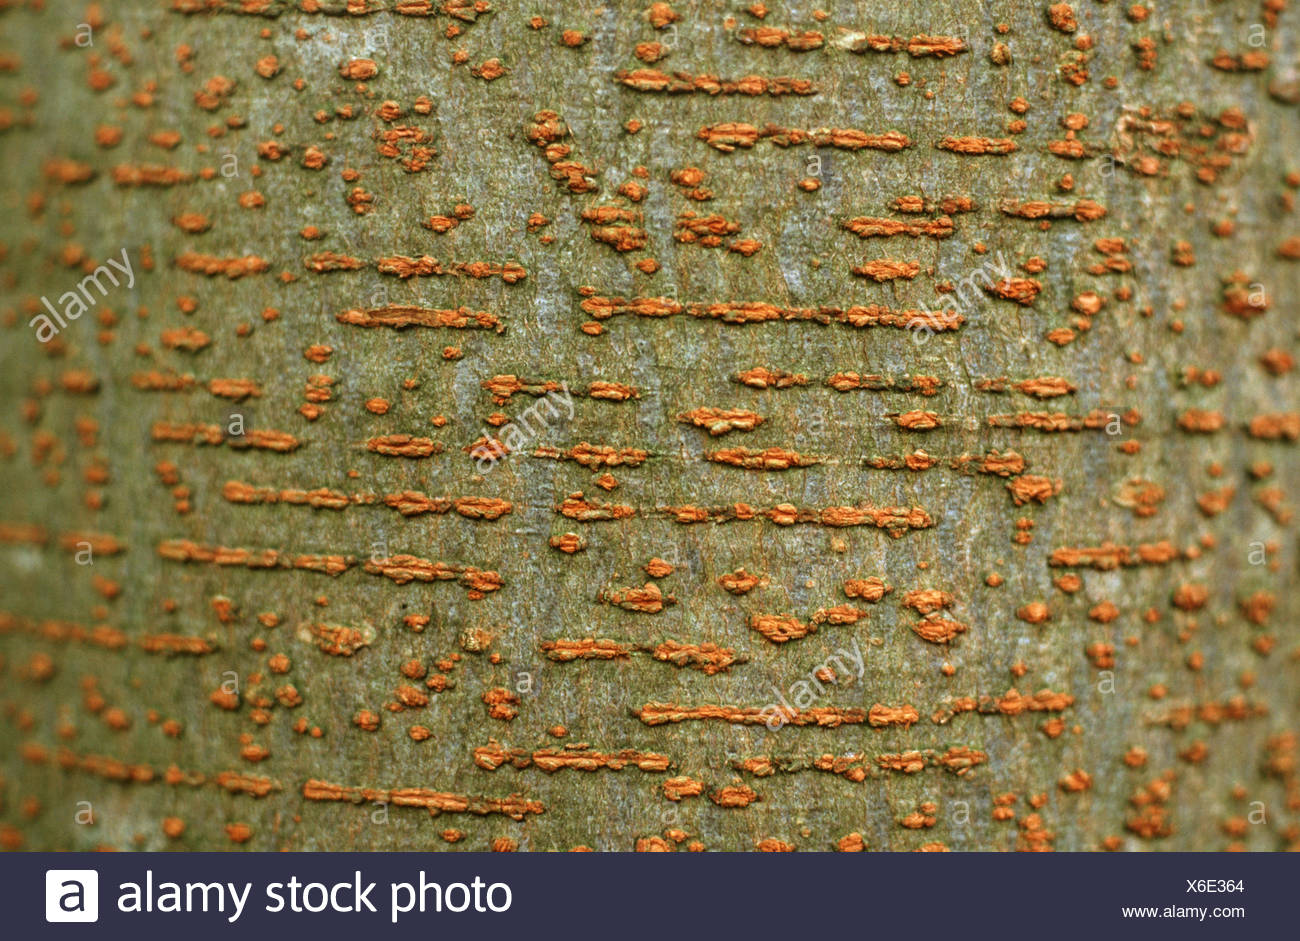 Japanese zelkova (Zelkova serrata, Zelkova acuminata, Zelkova hirta, Zelkova keaki ), bark - Stock Image